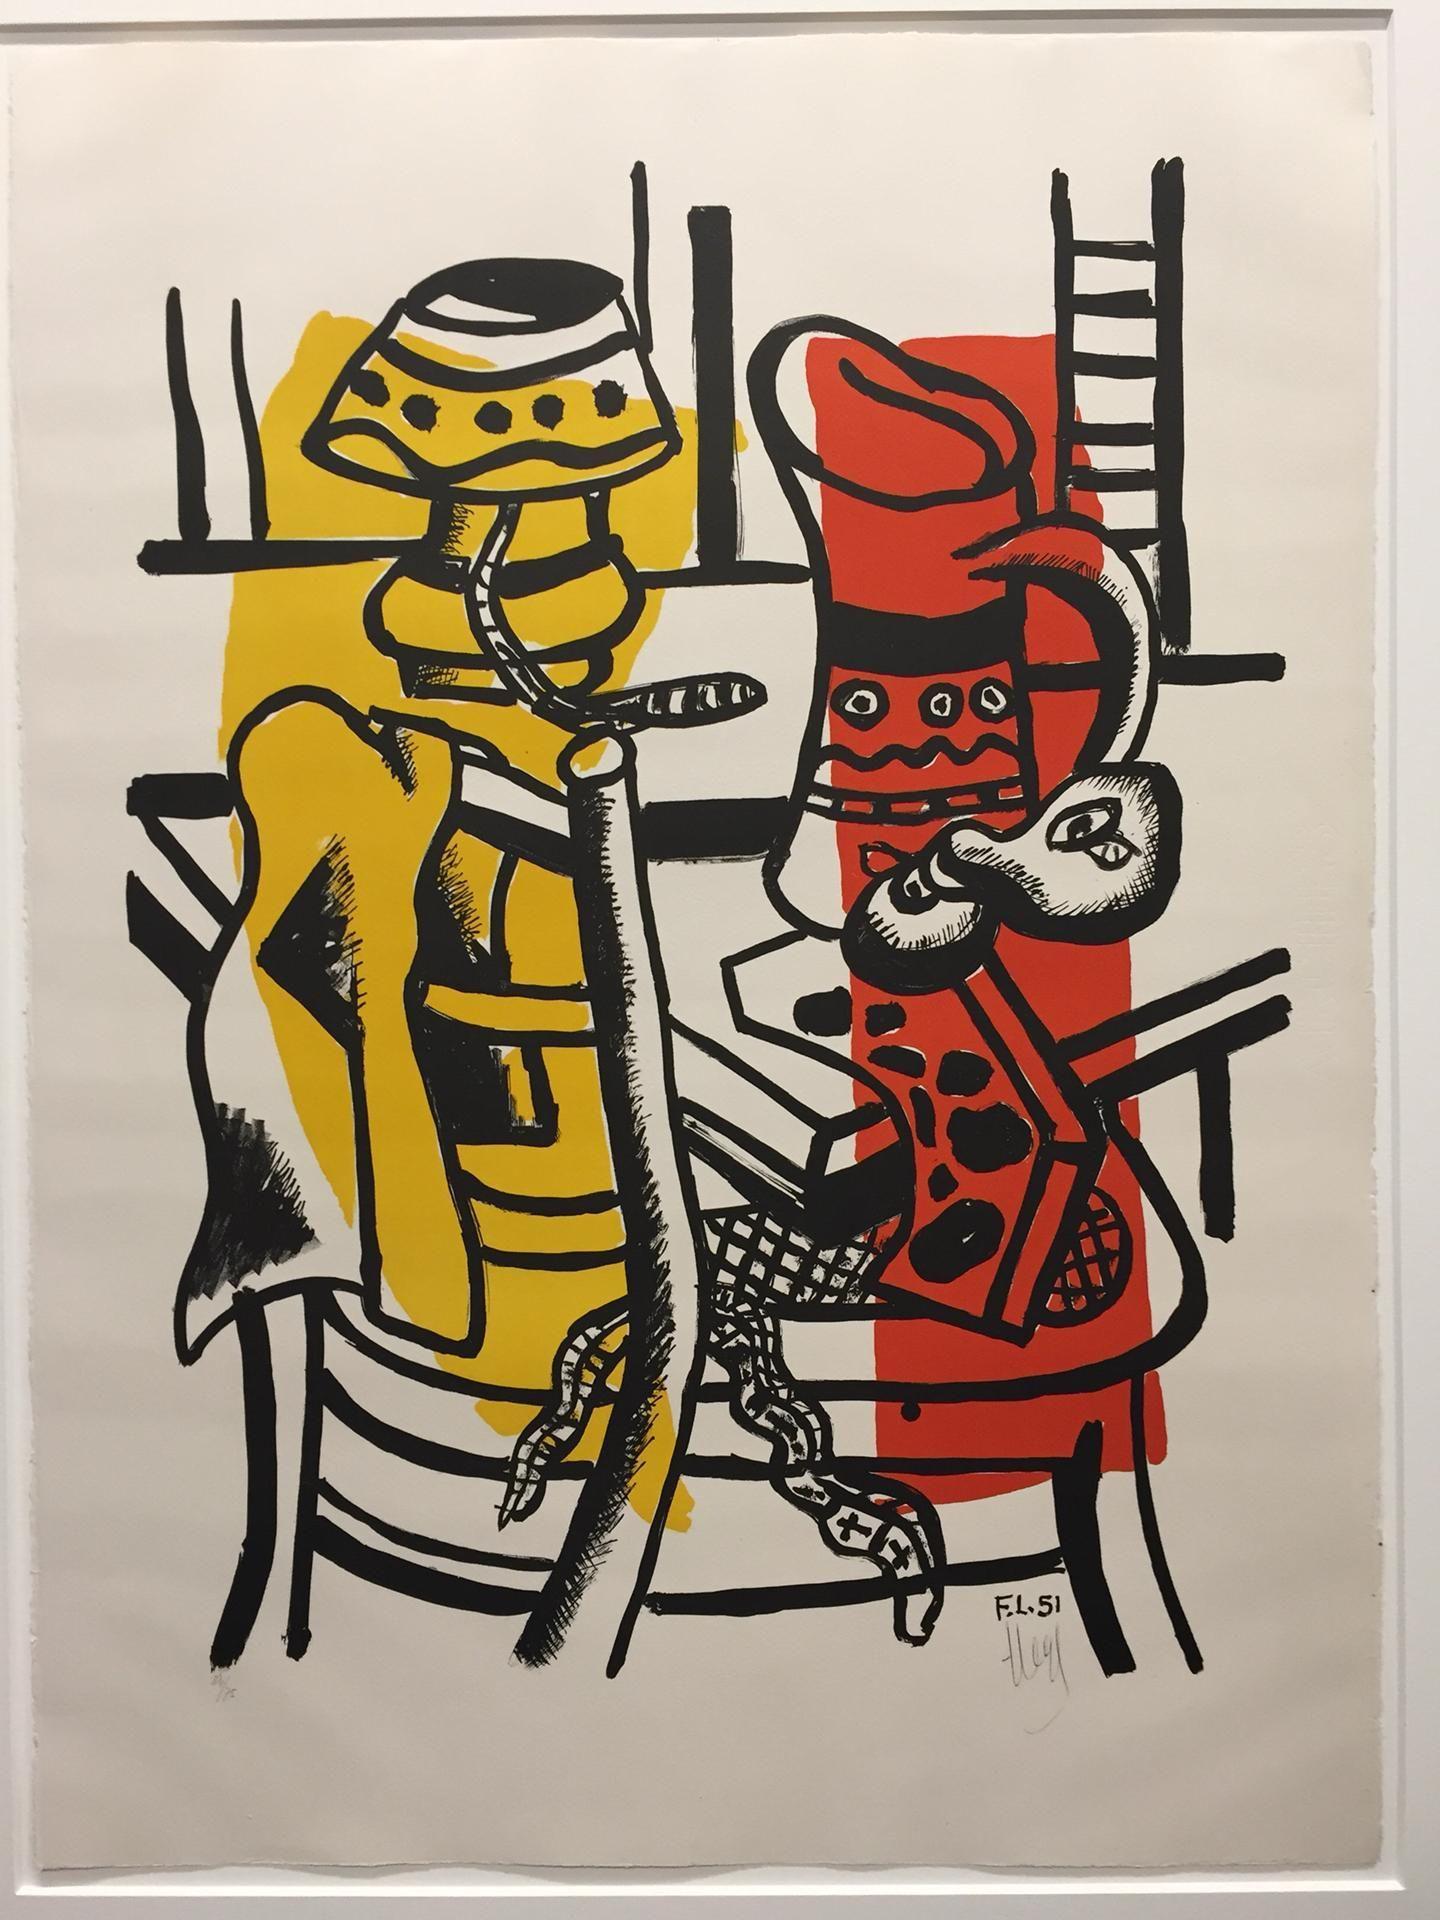 Fernand Leger - La chaise, 1955